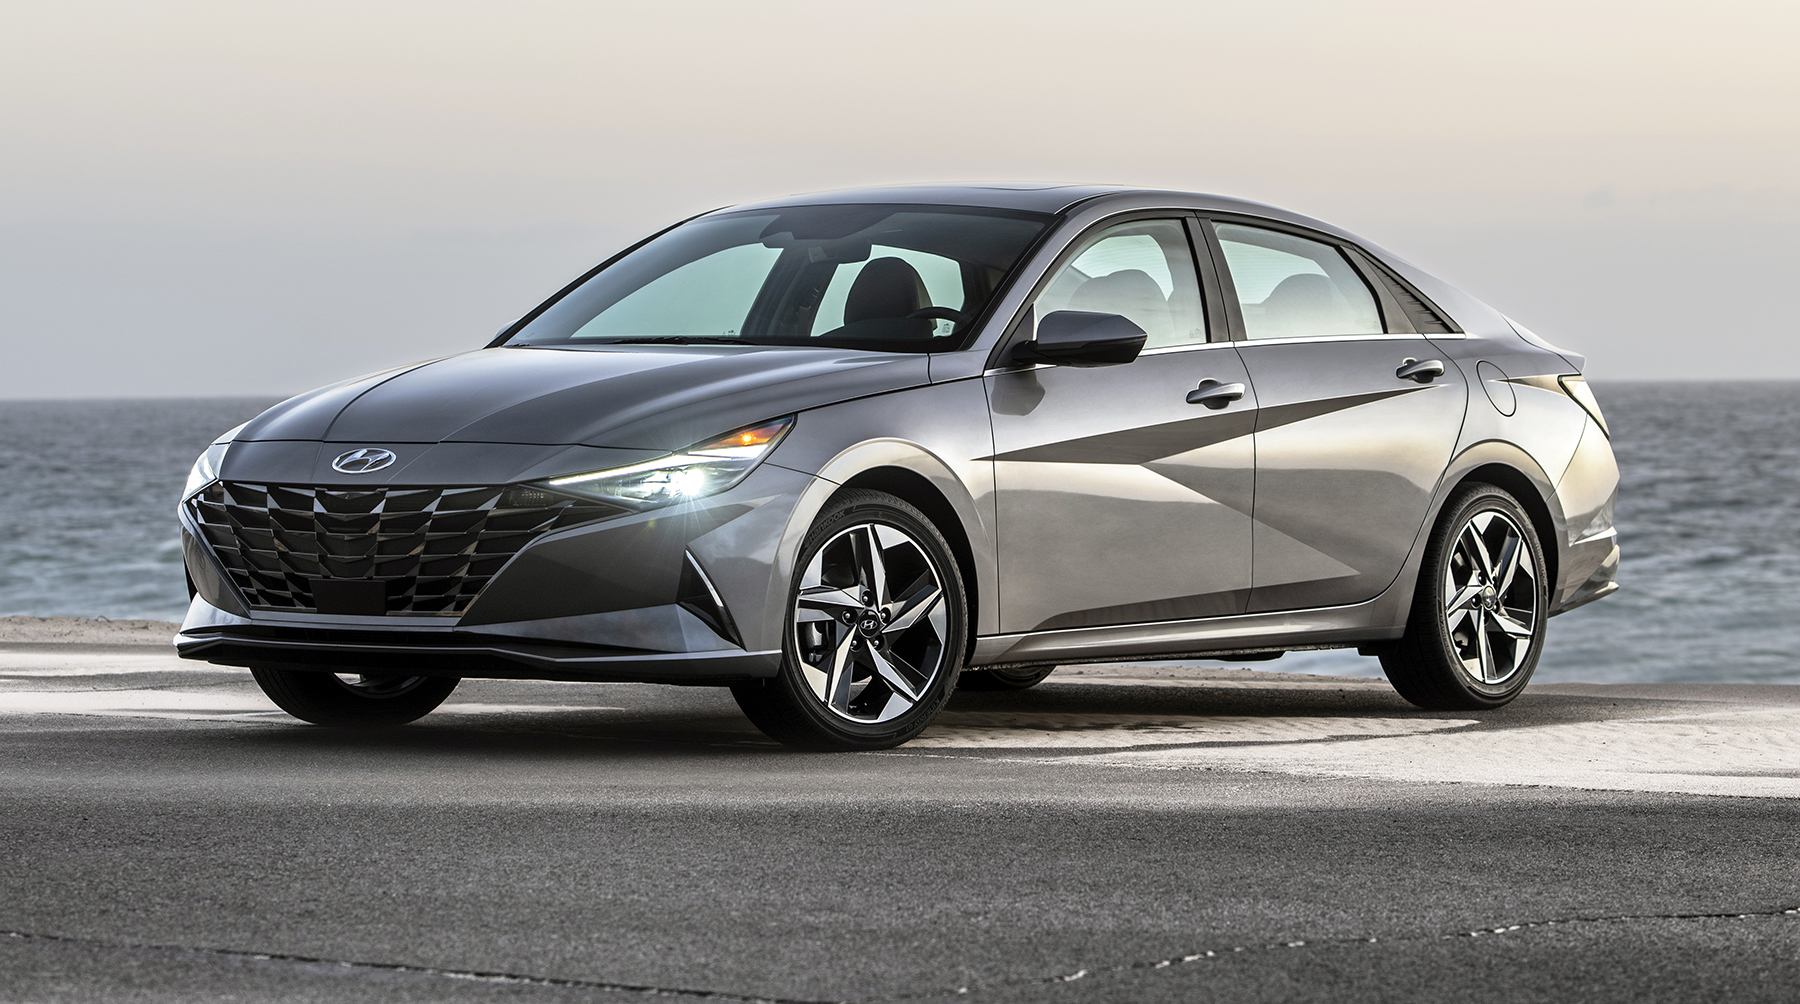 New Hyundai Elantra Wins 2021 Hispanic Best Car Model Award 2